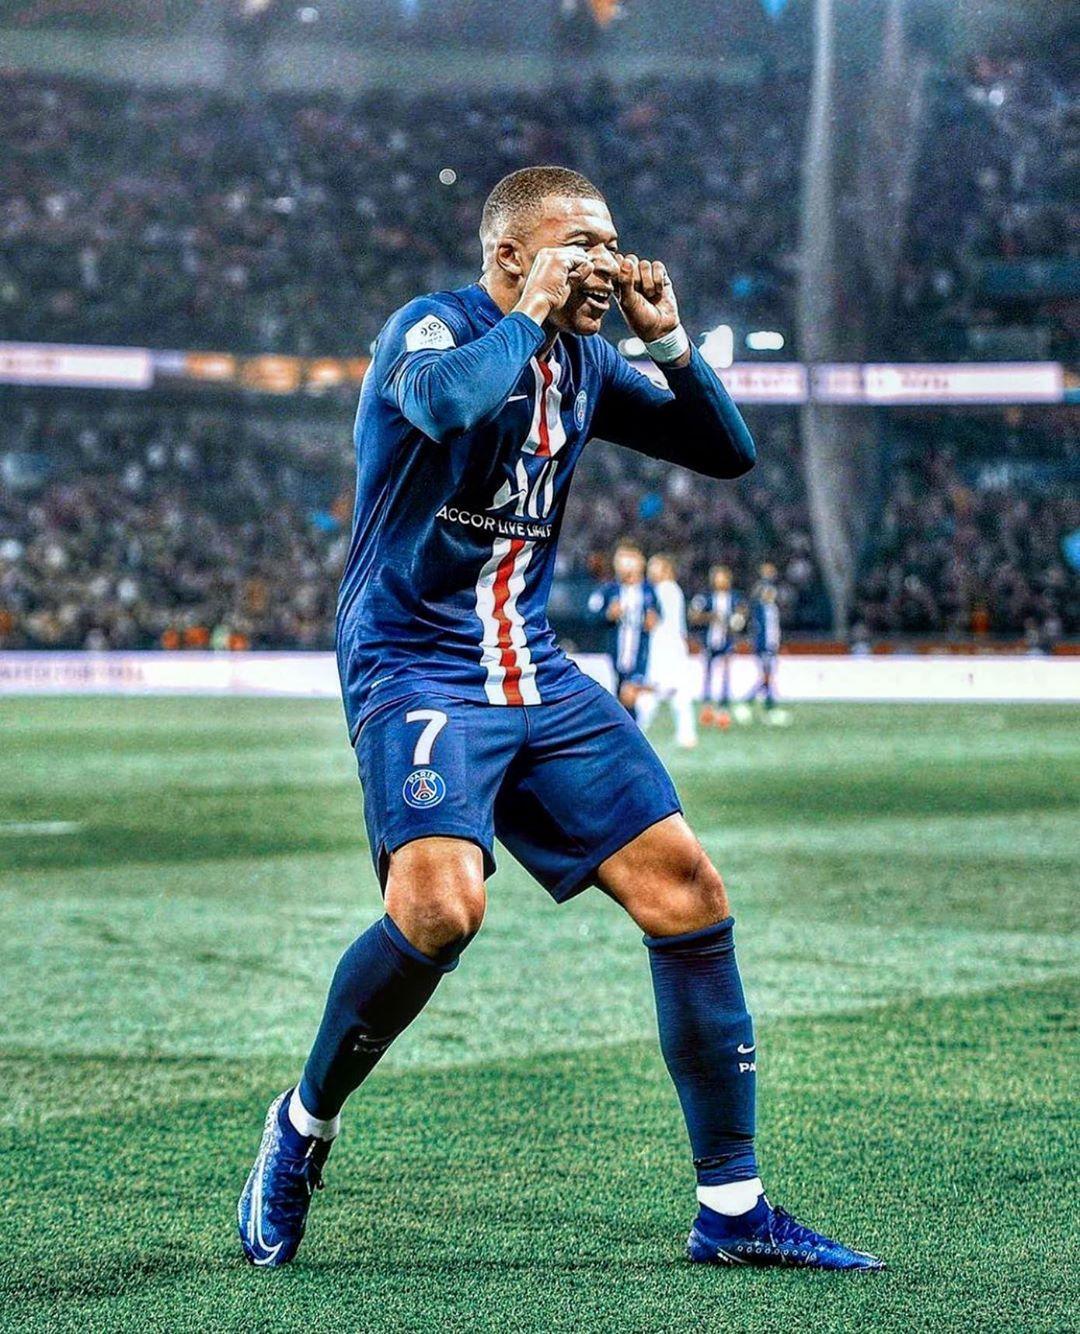 et this celebration on FIFA. ASAP. @easportsfifa 😆 📸 @futboltime ——————————————————————————— # ...